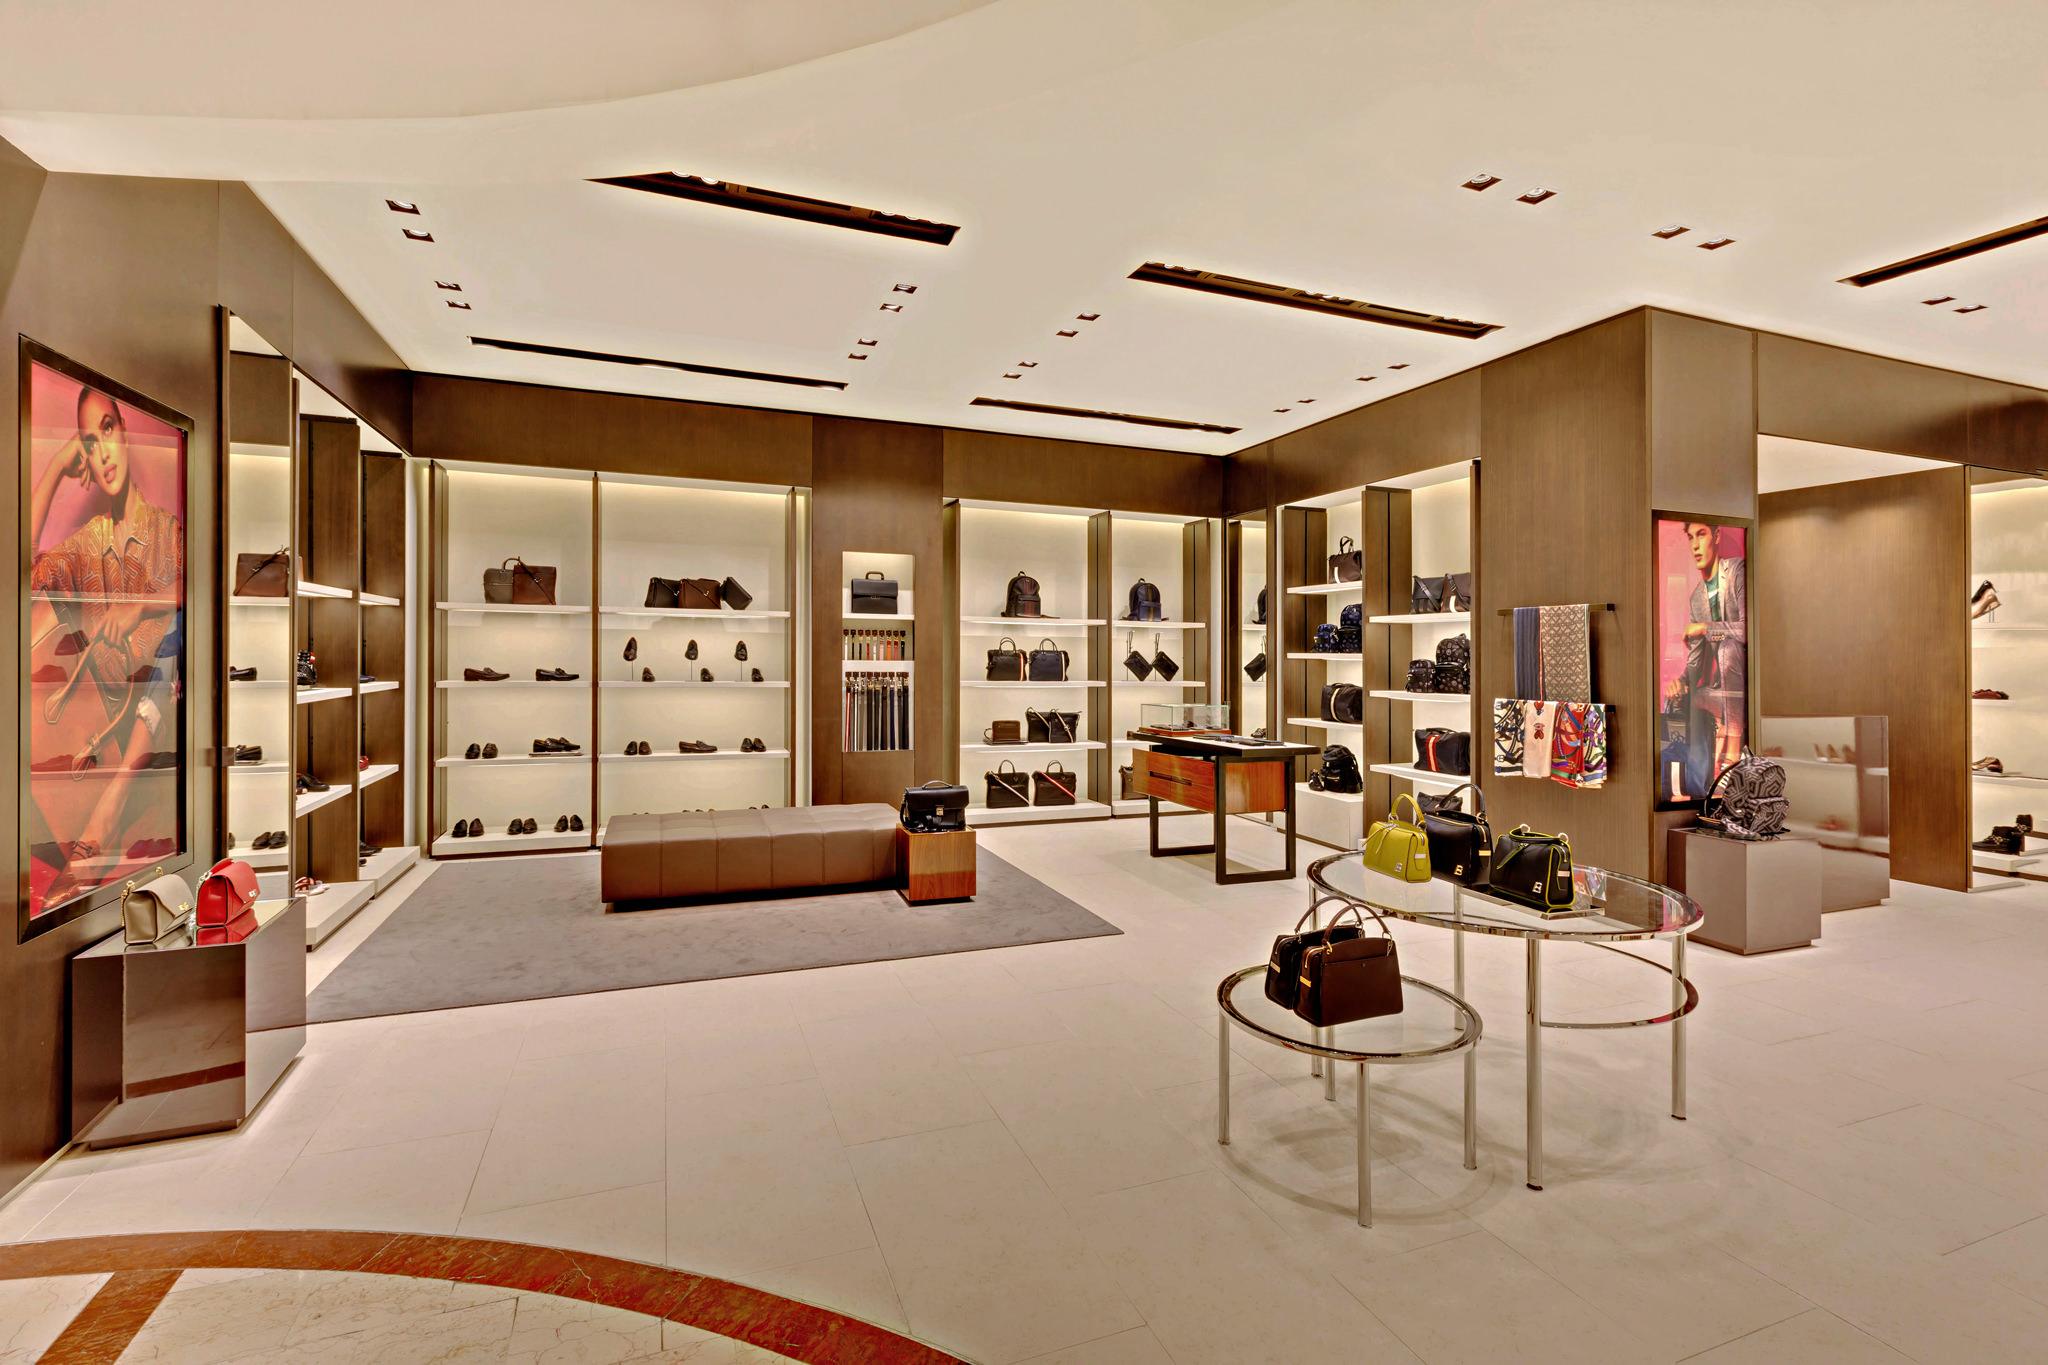 20170721 - Bally - HCM - Commercial - Interior - Store - Retouch 0003.jpg